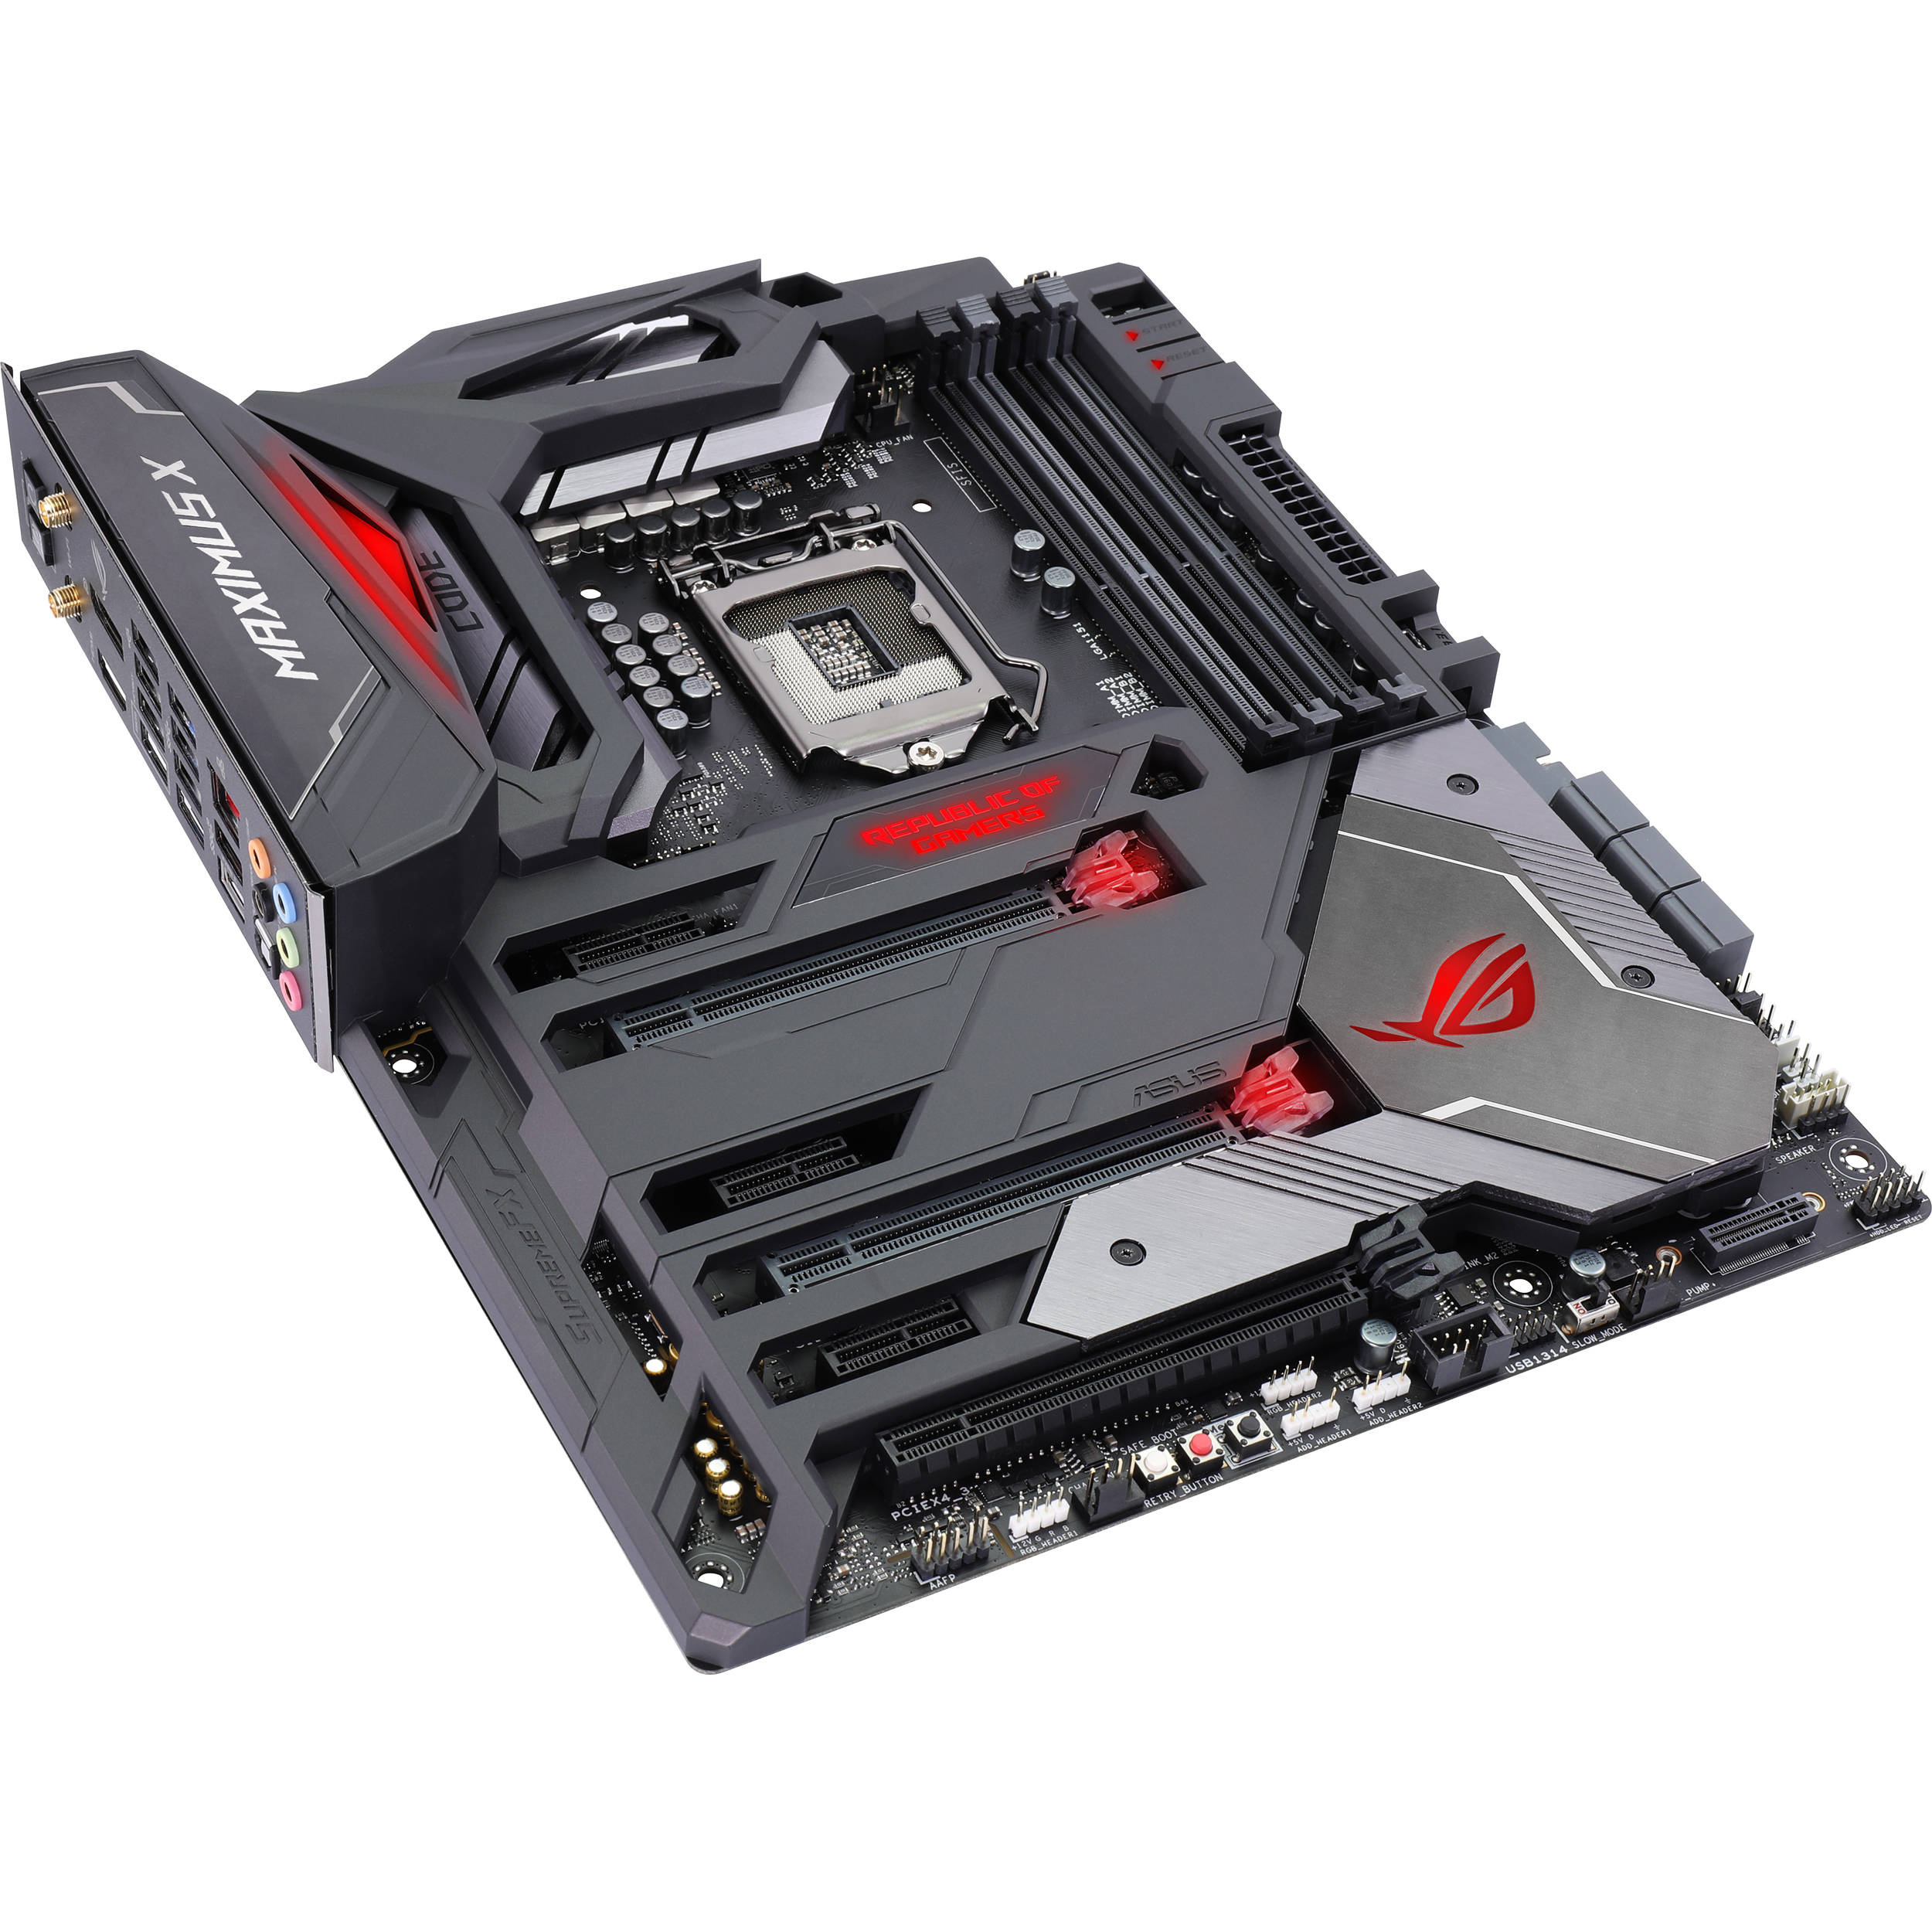 ASUS ROG Maximus X Code LGA 1151 Z370 ATX Motherboard